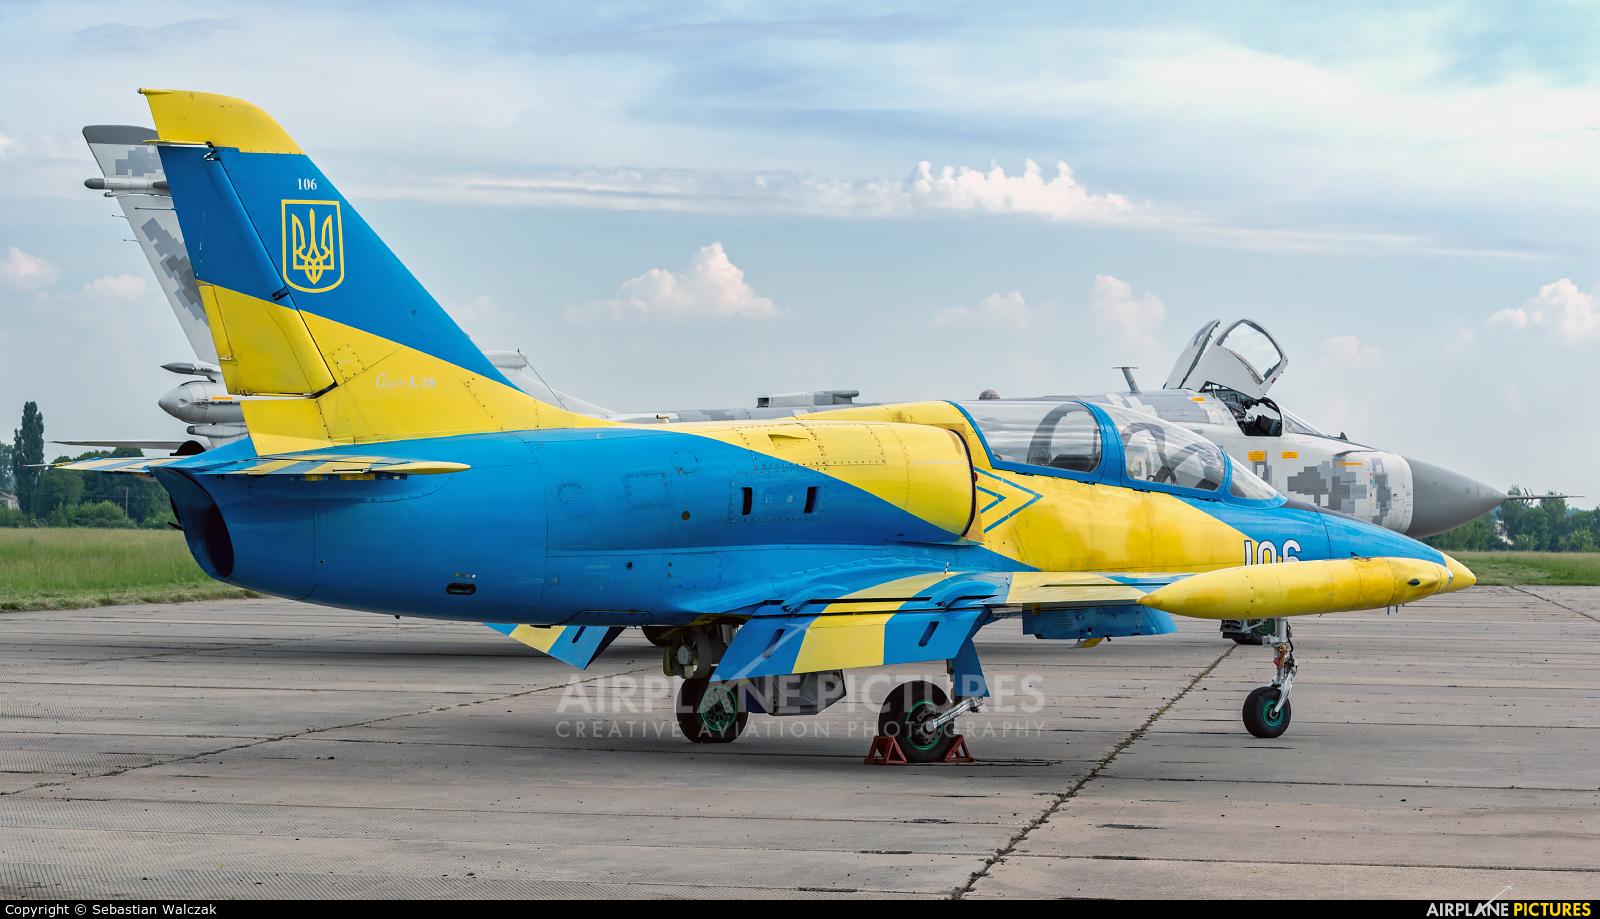 Ukraine - Air Force 106 aircraft at Starokostyantyniv